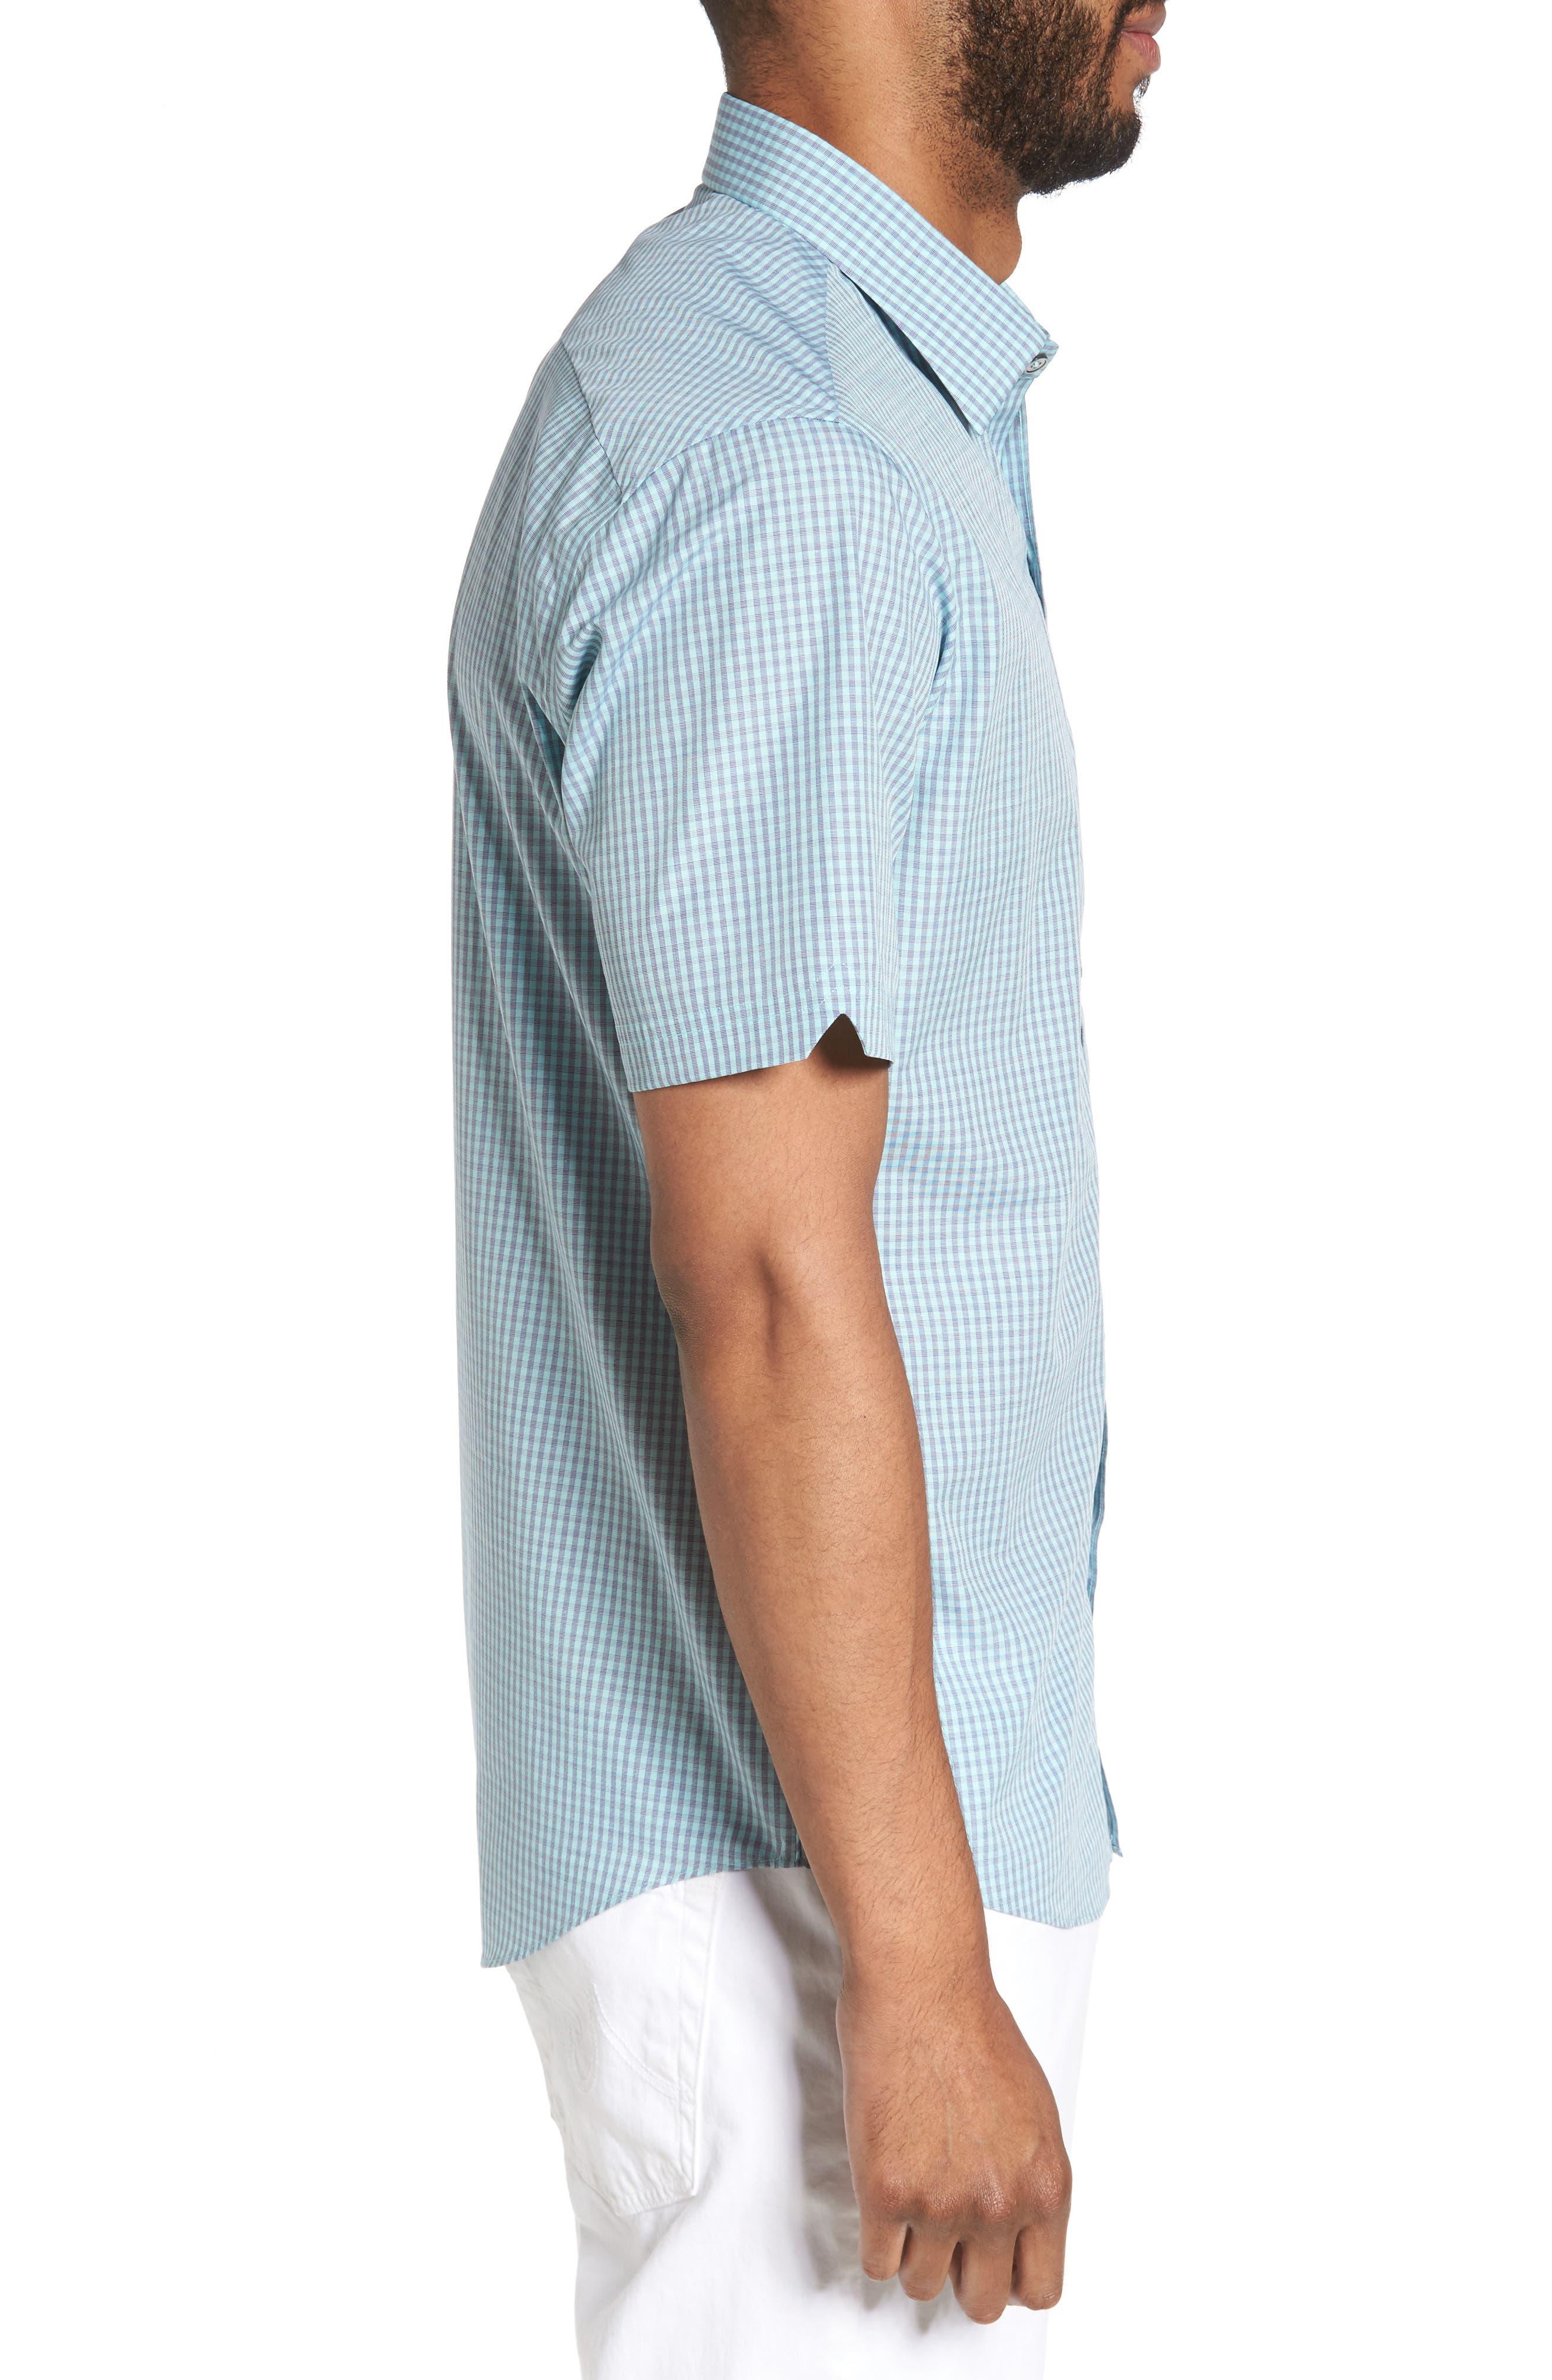 Rappaport Sport Shirt,                             Alternate thumbnail 3, color,                             332